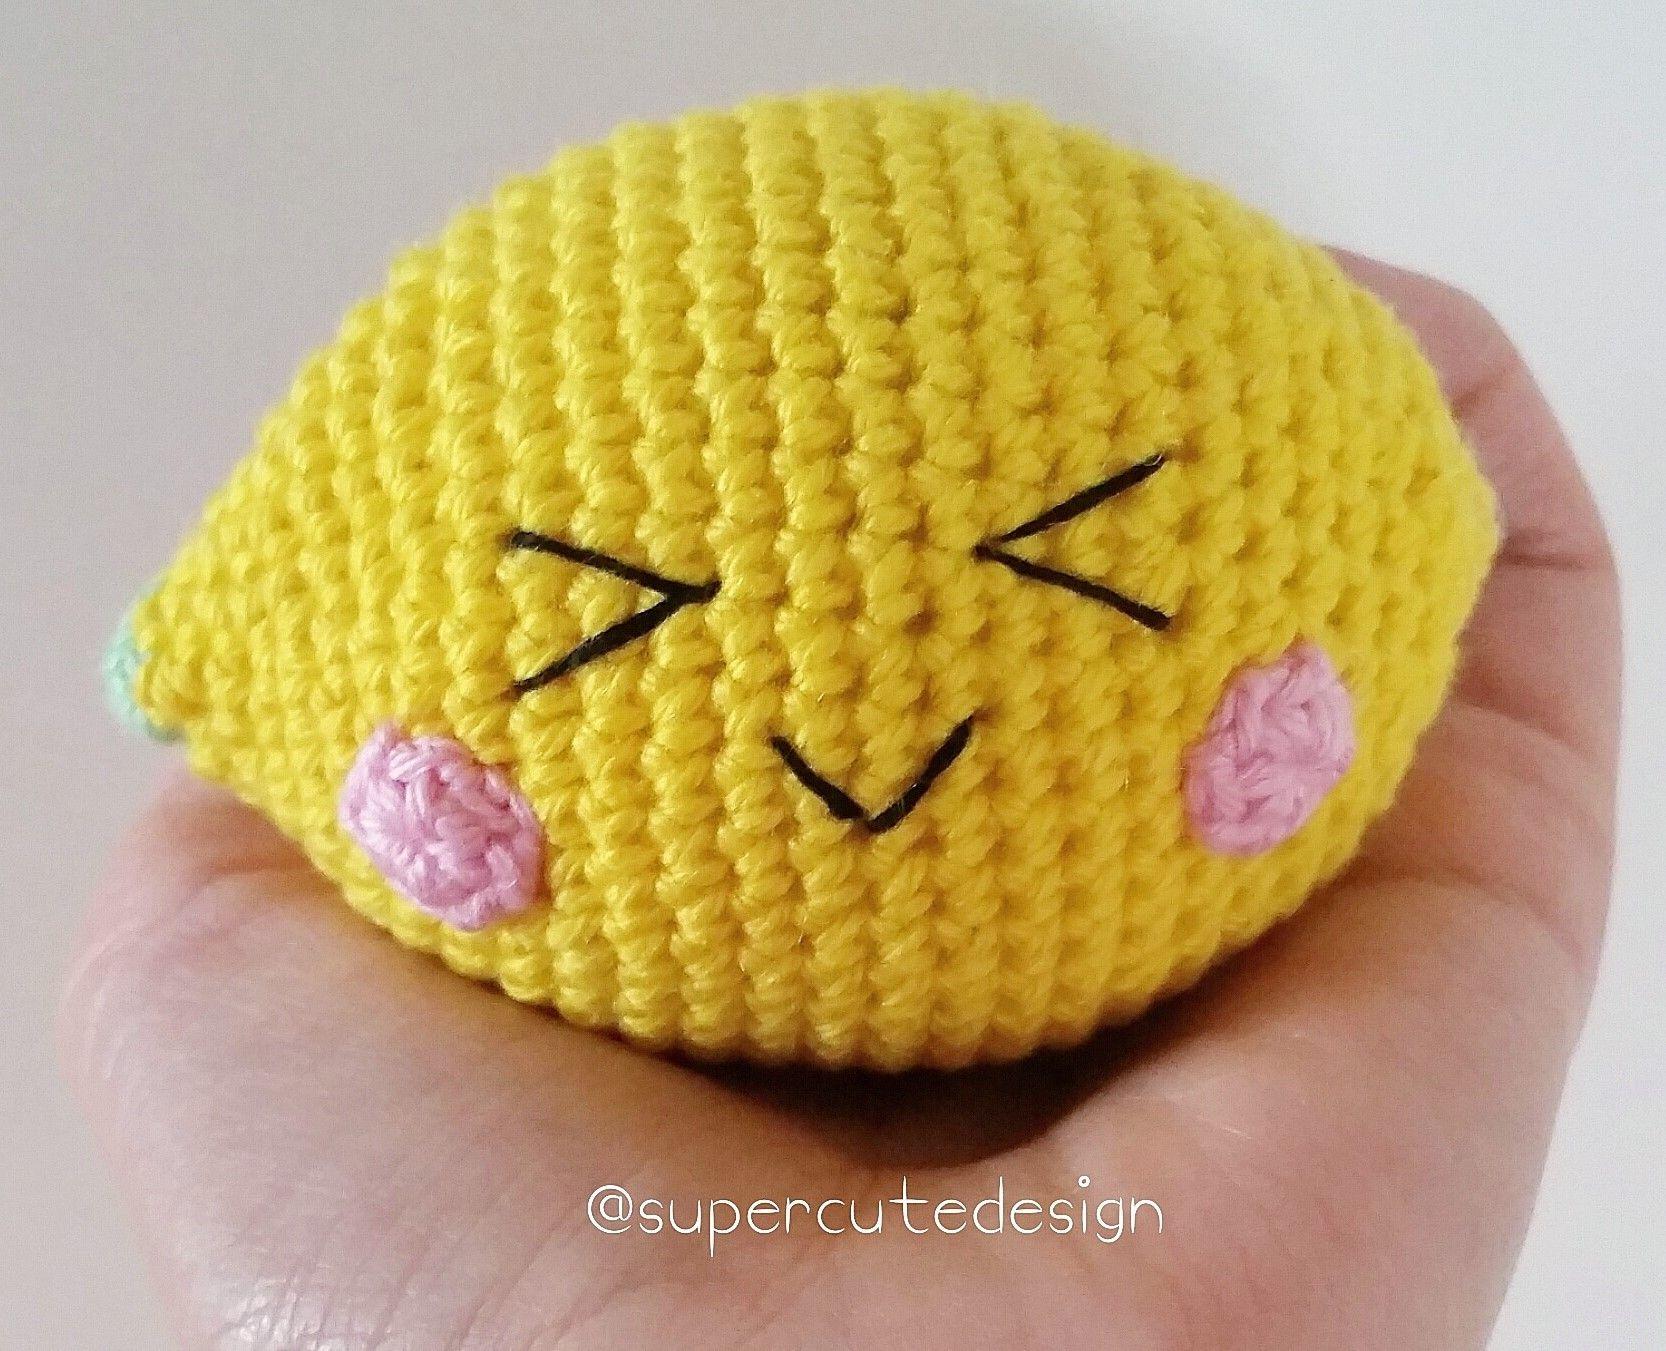 Pocoyo Amigurumi Nacións : Lemon by jennifer free crochet pattern supercutedesign